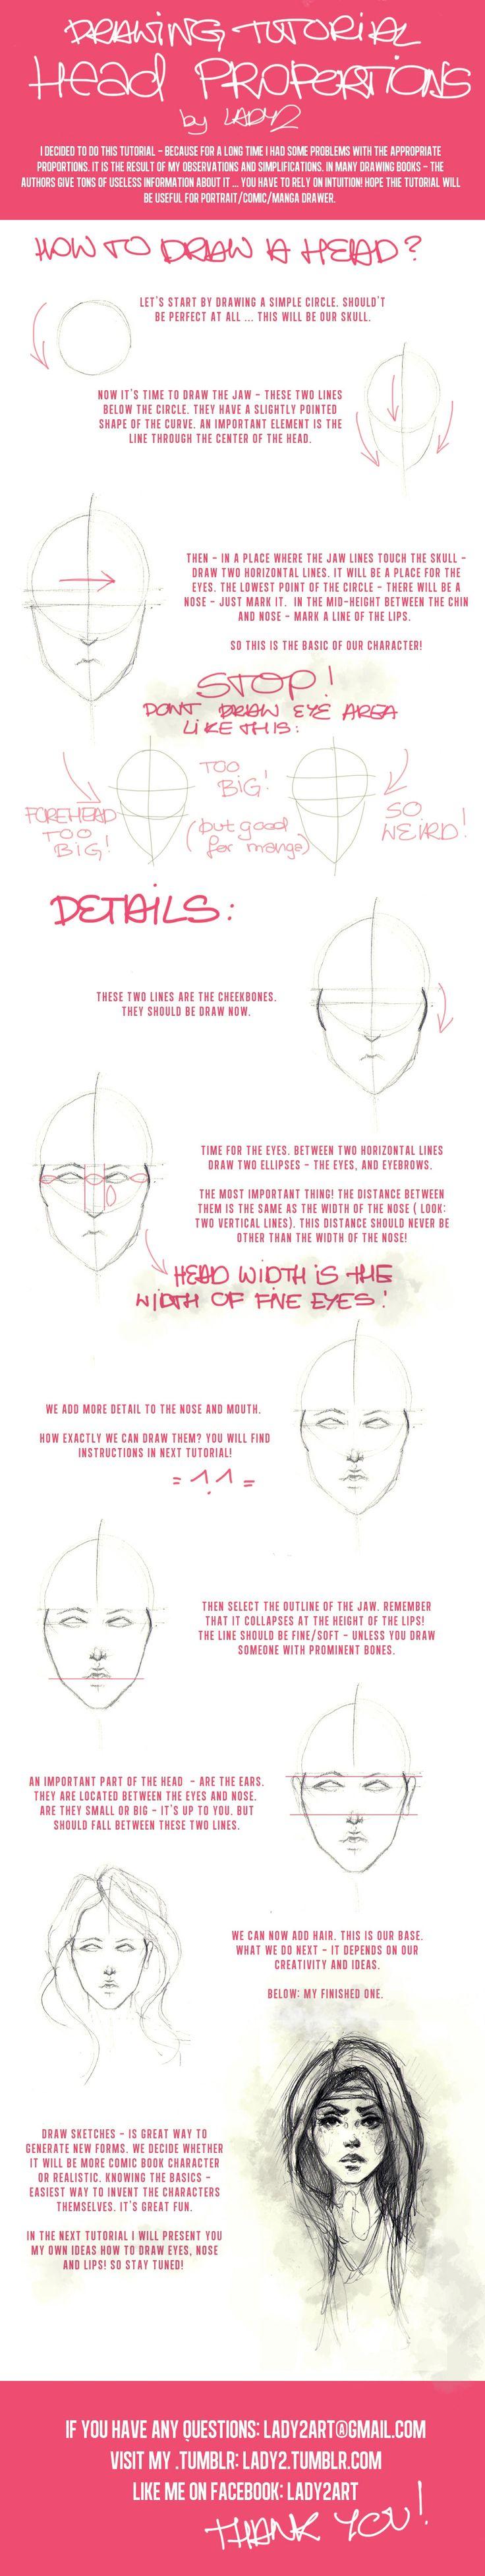 head_proportions_tutorial. by Lady2.deviantart.com on @deviantART